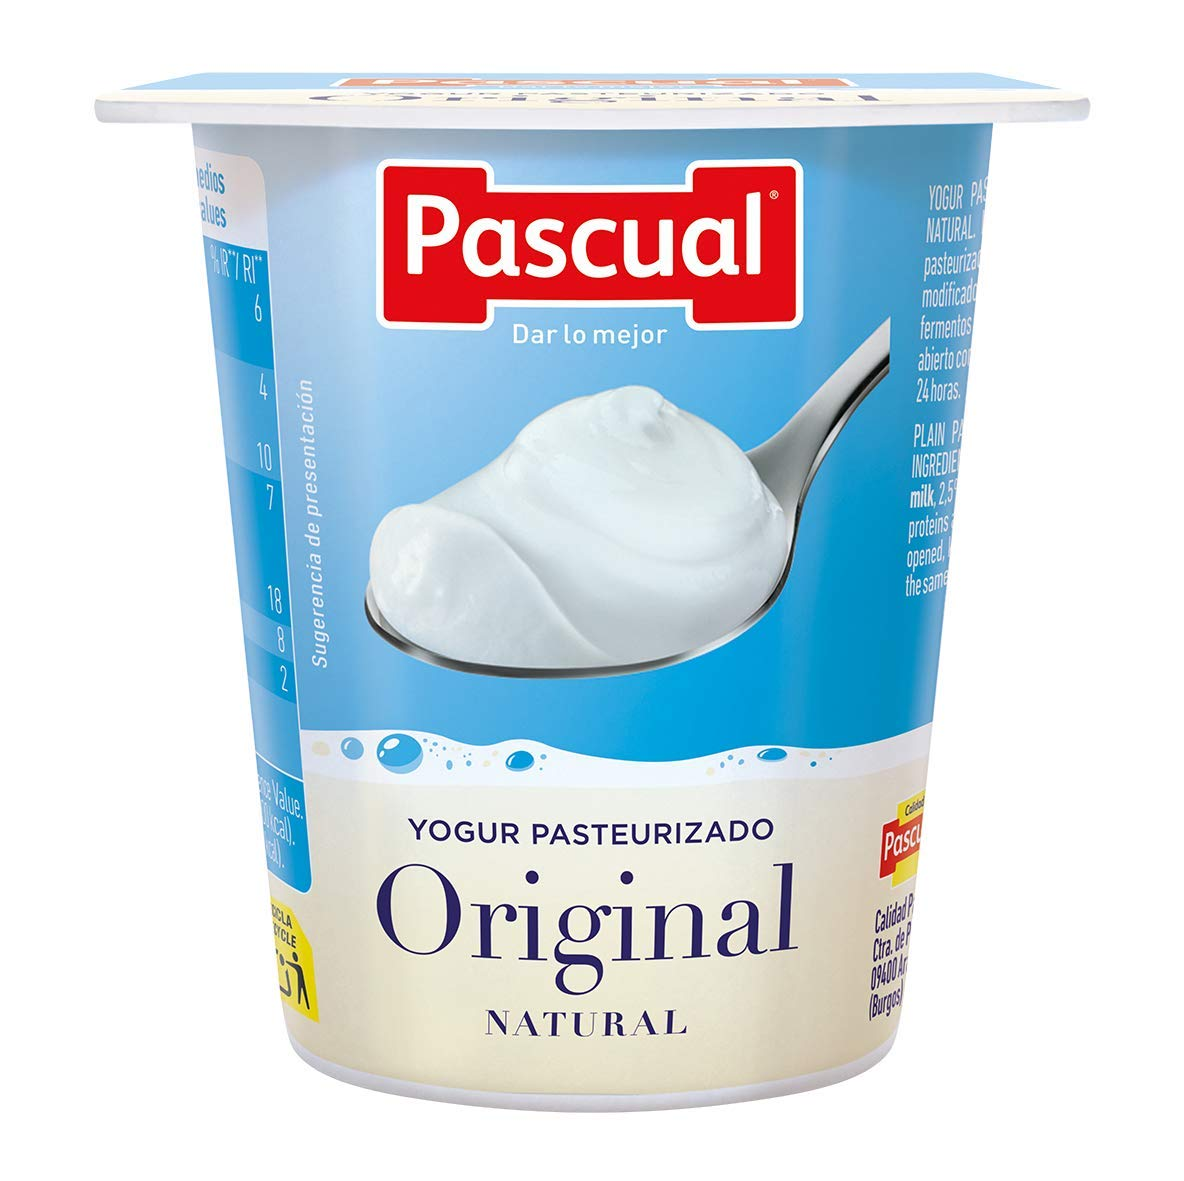 Pascual Yogur Original Sabor Natural - Paquete de 4 x 125 gr ...